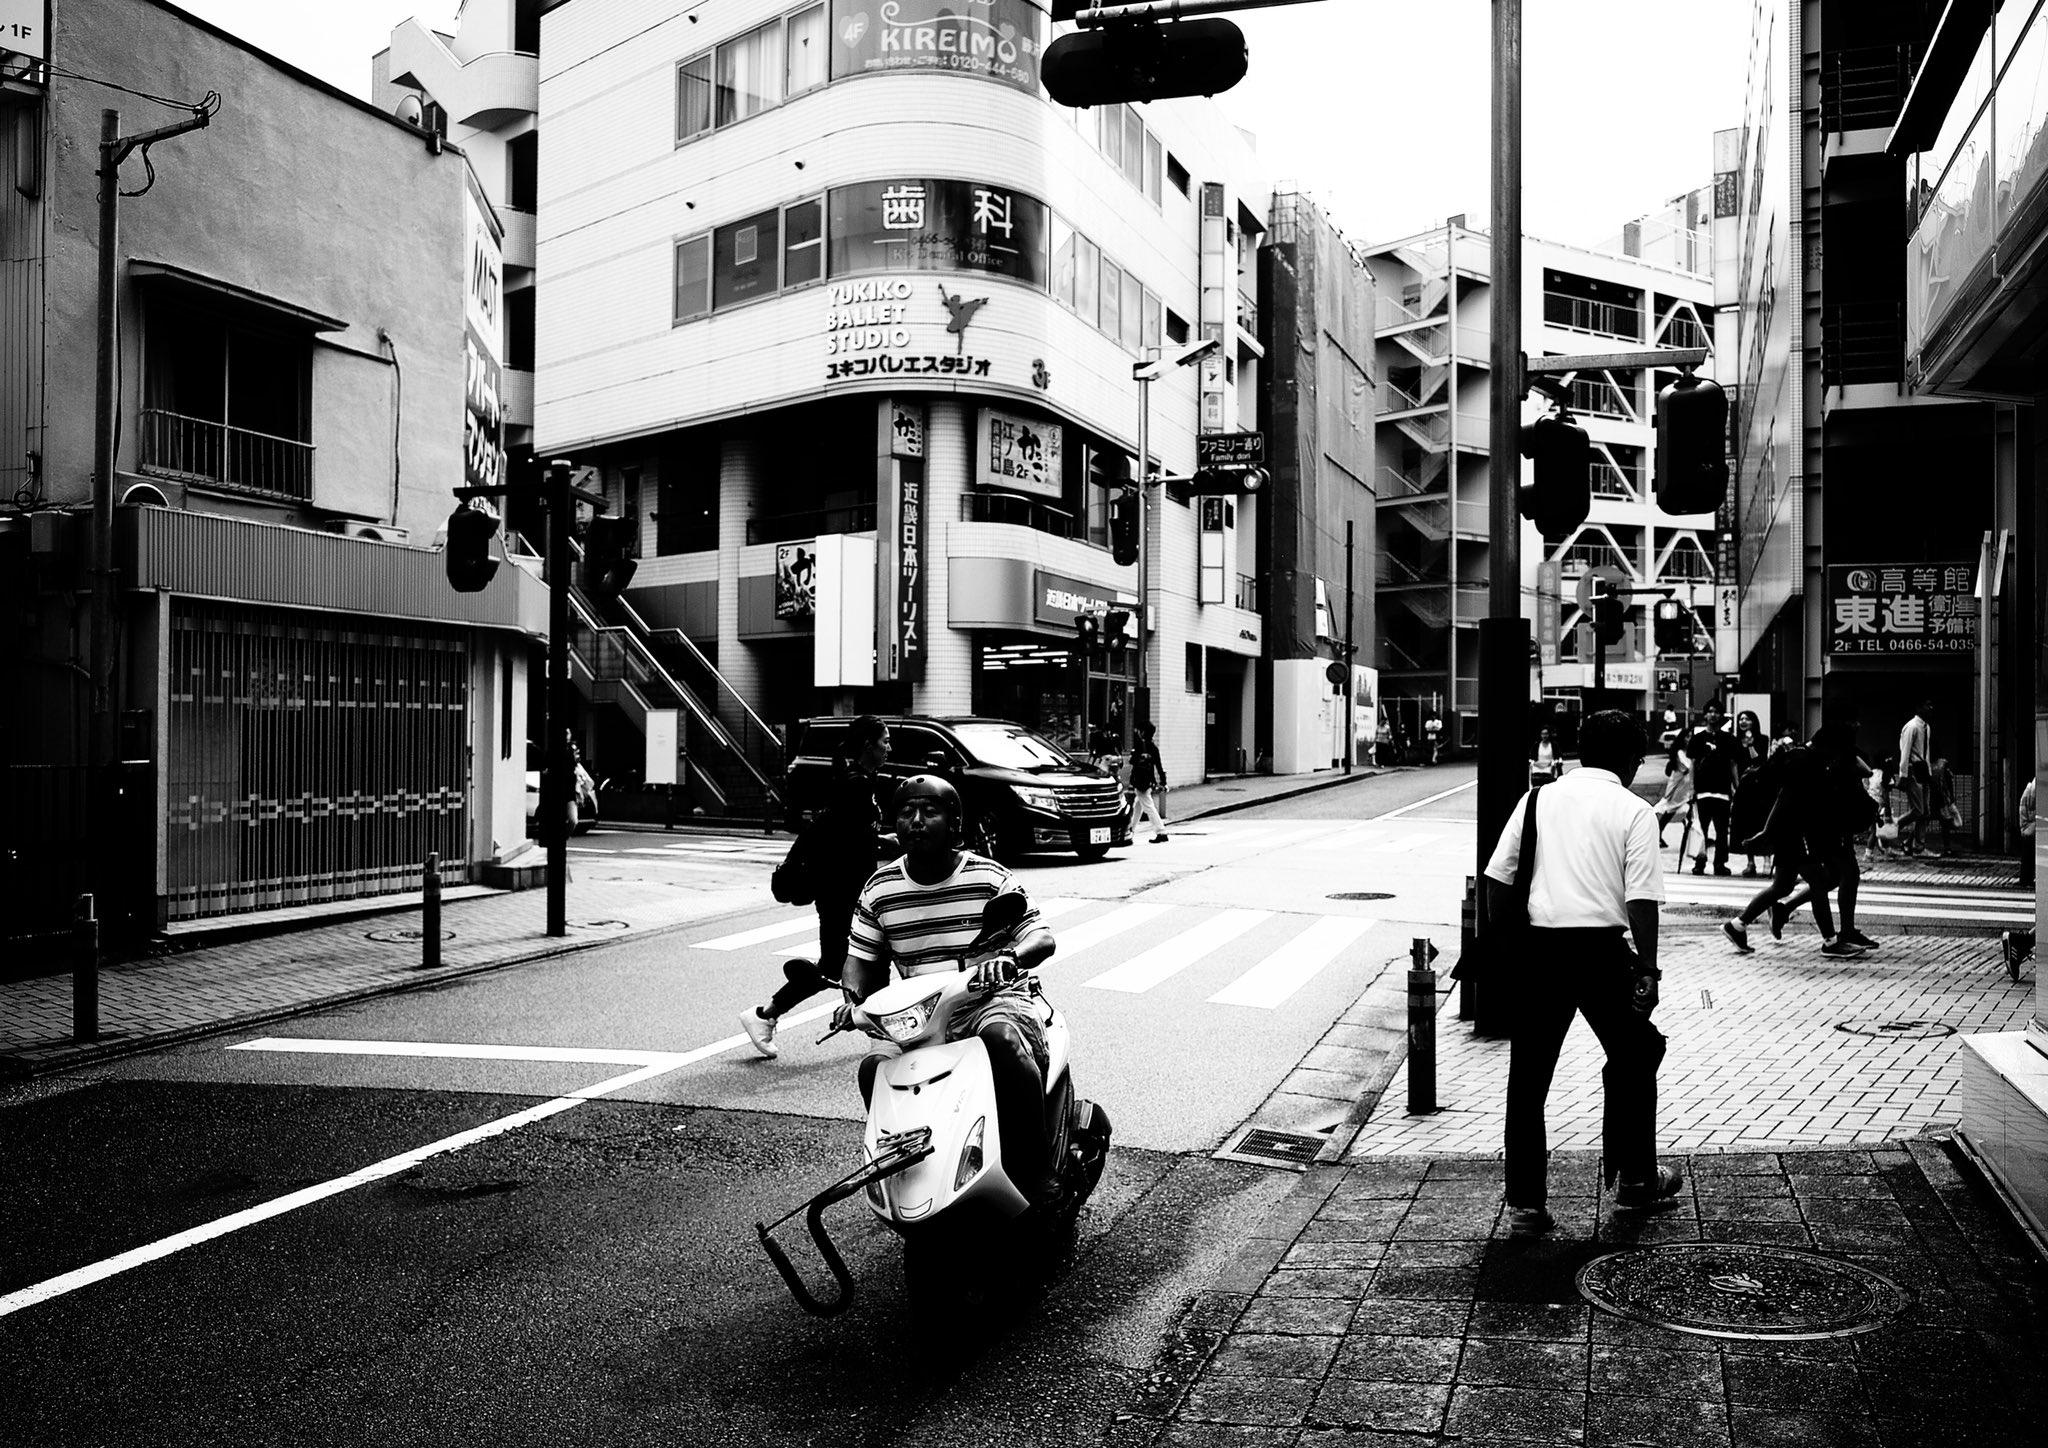 black_and_white_street_photography_4.jpg